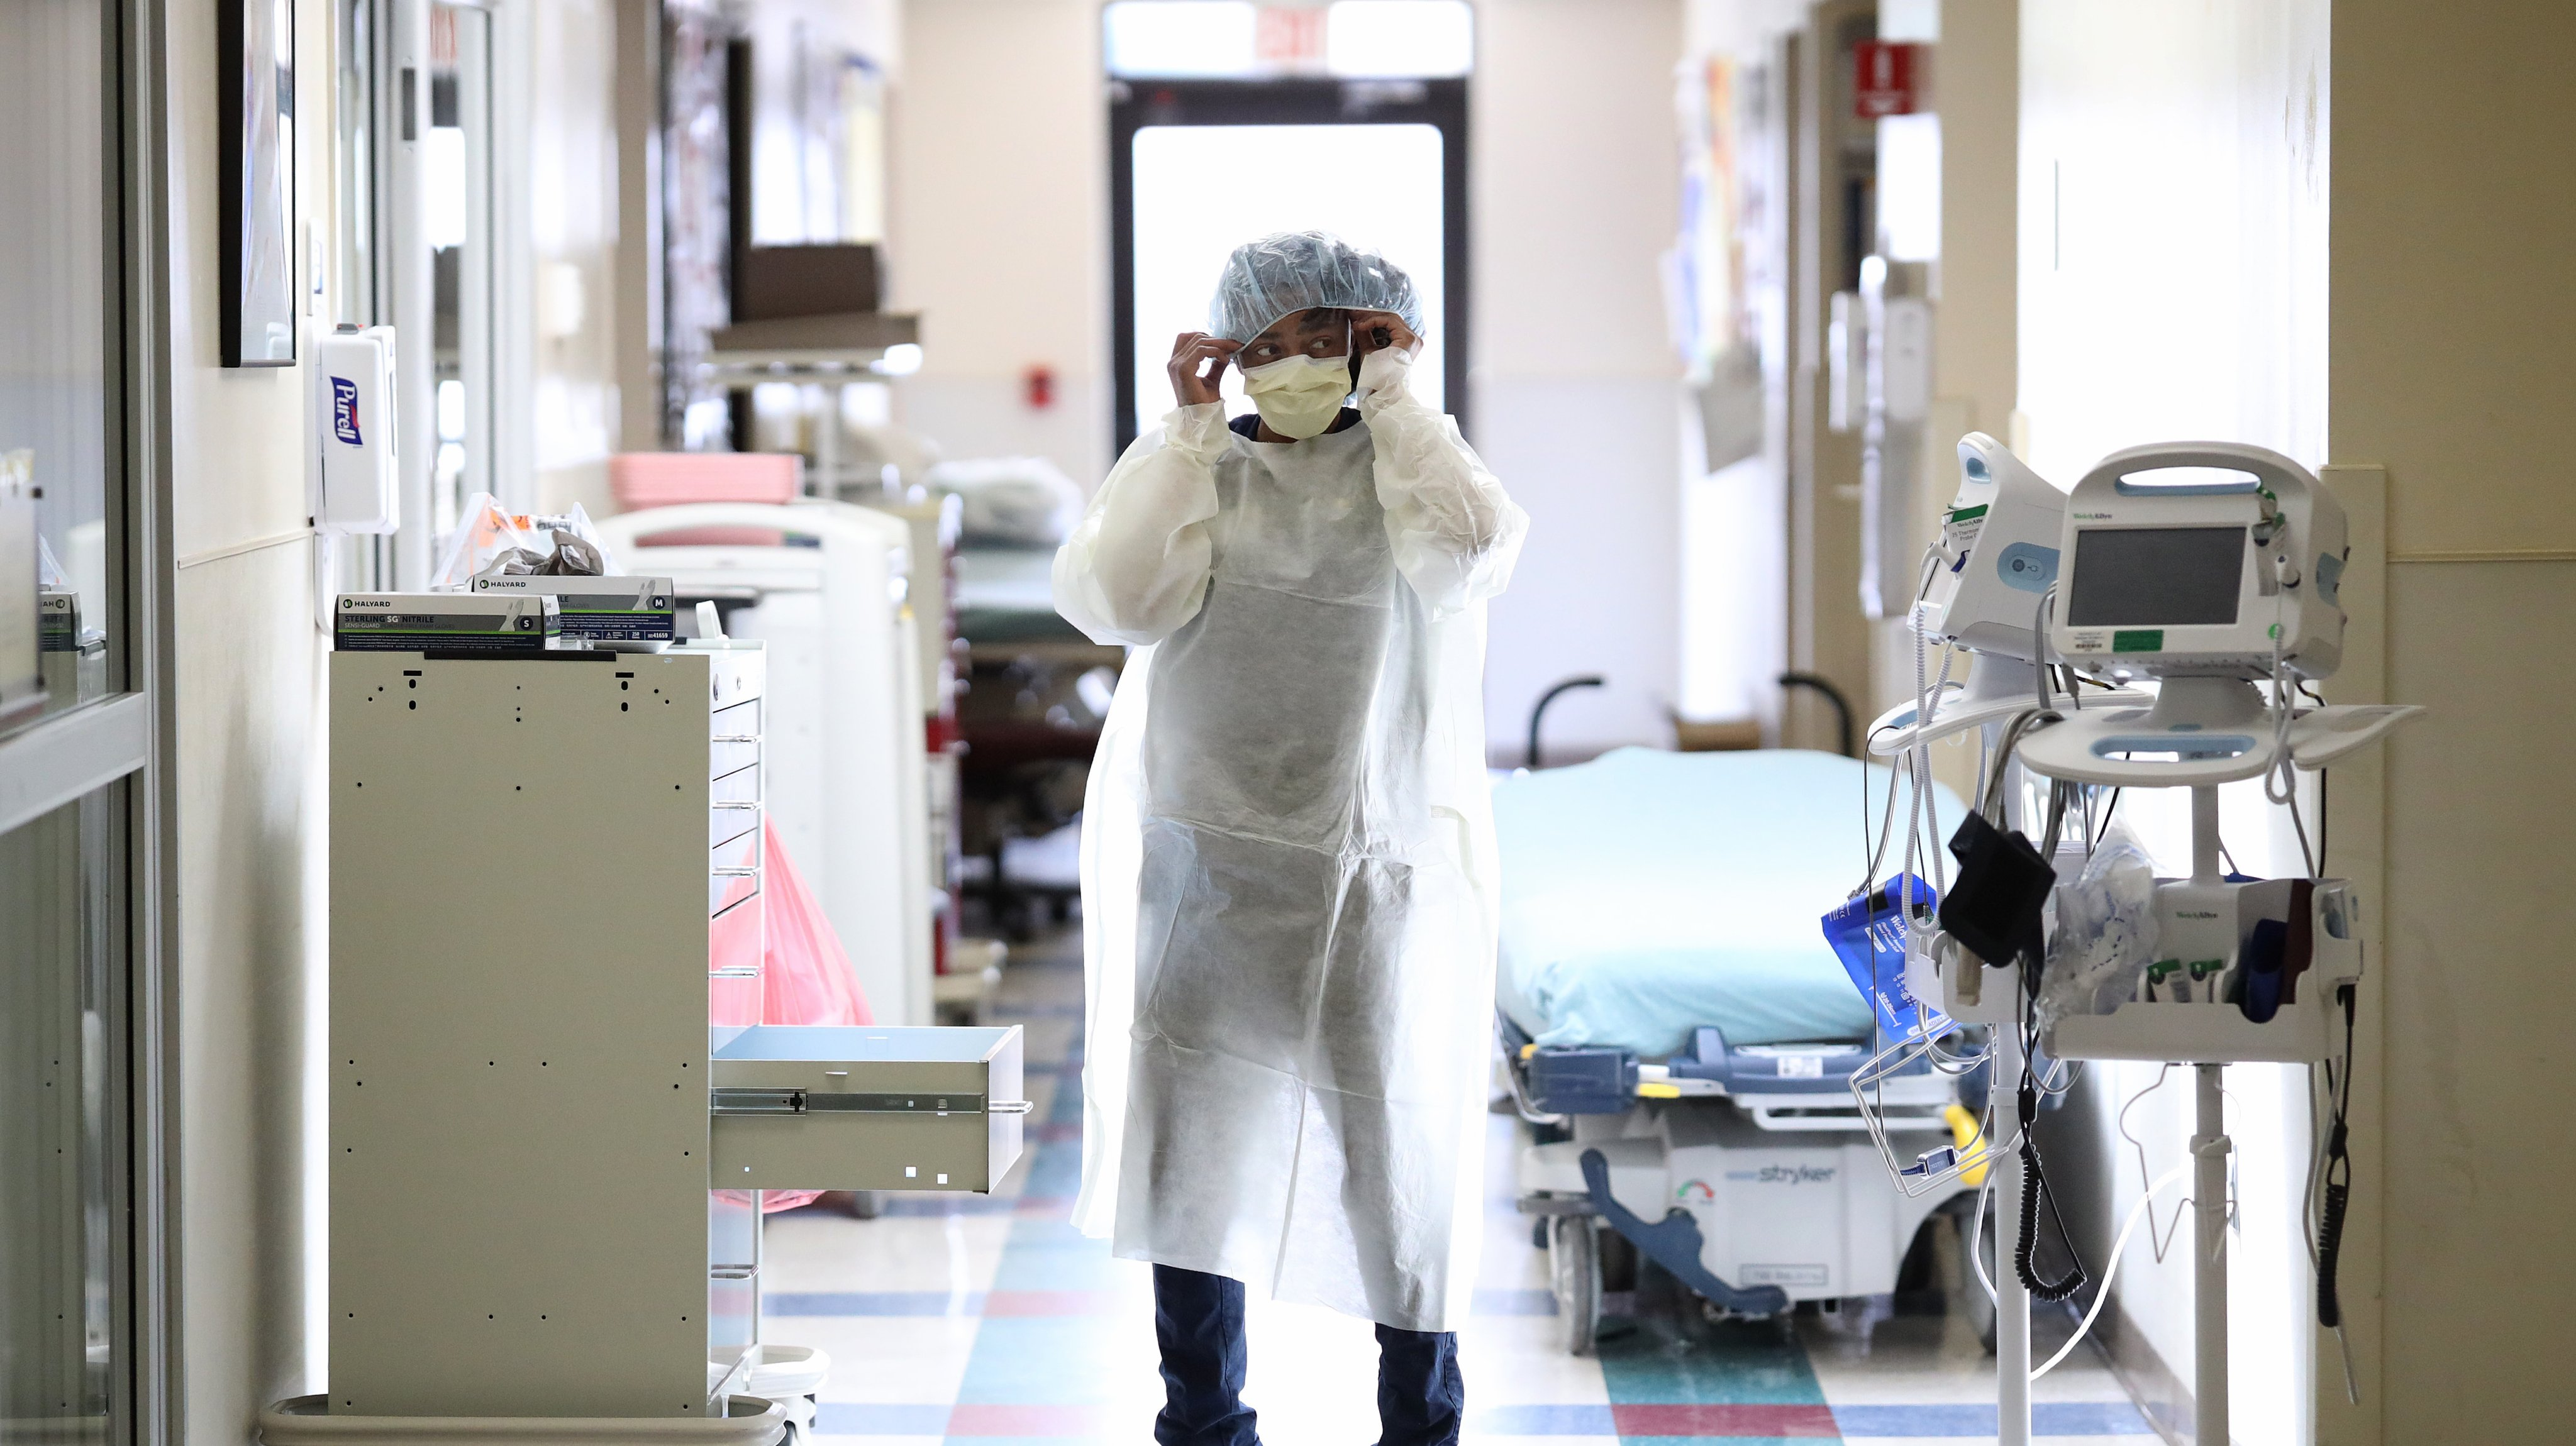 Medical Workers Inside Maryland Hospital Work During Coronavirus Pandemic